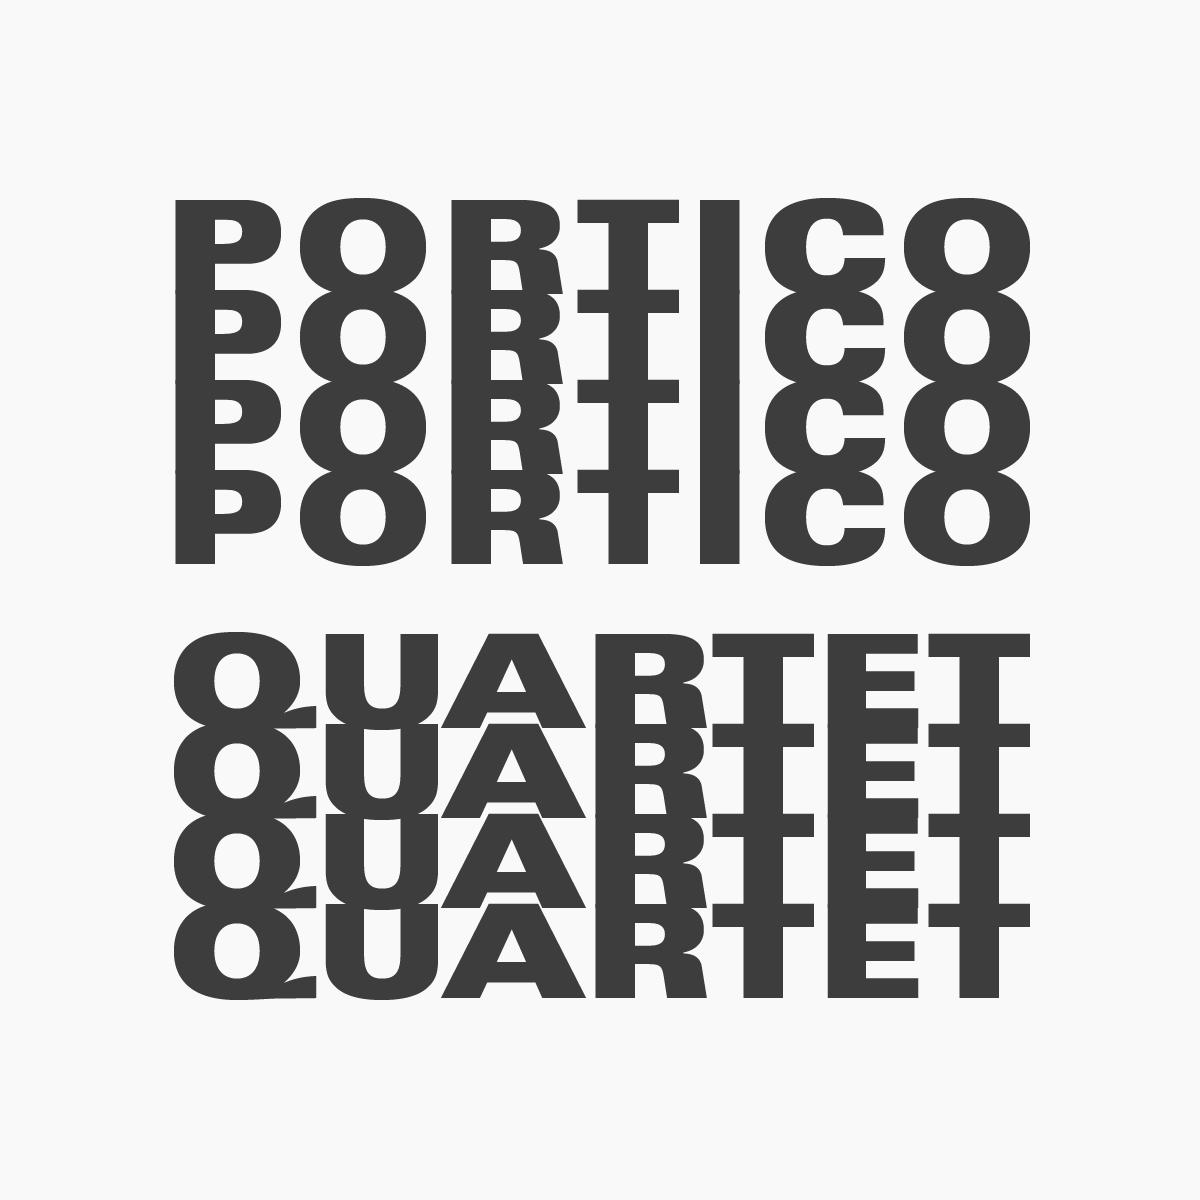 Listen to Portico Quartet's new single 'Endless'